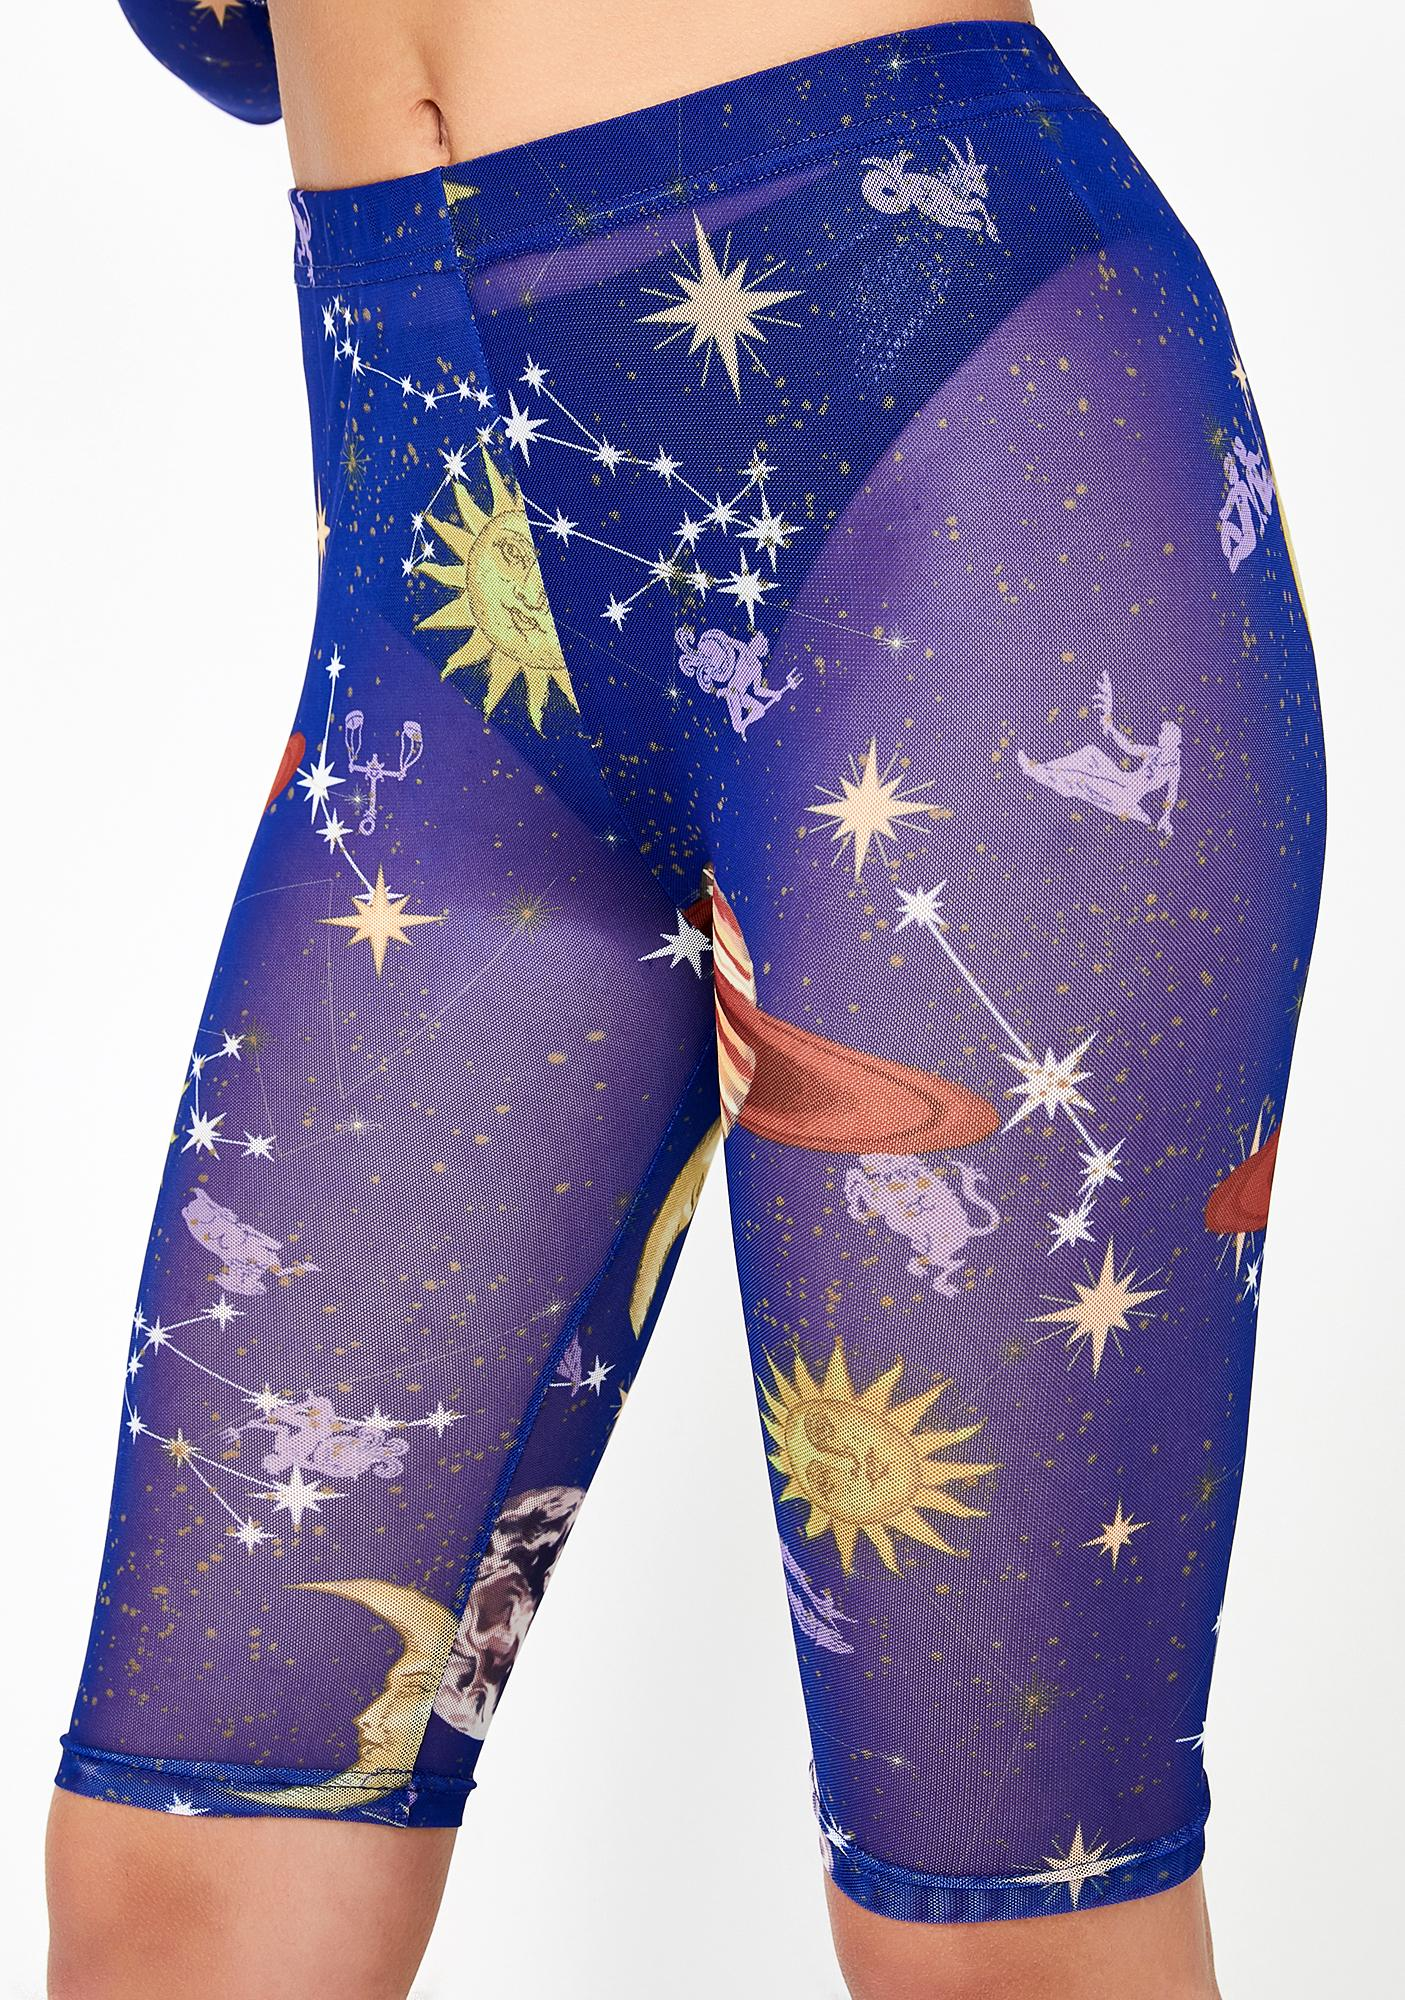 HOROSCOPEZ Astro World Biker Shorts